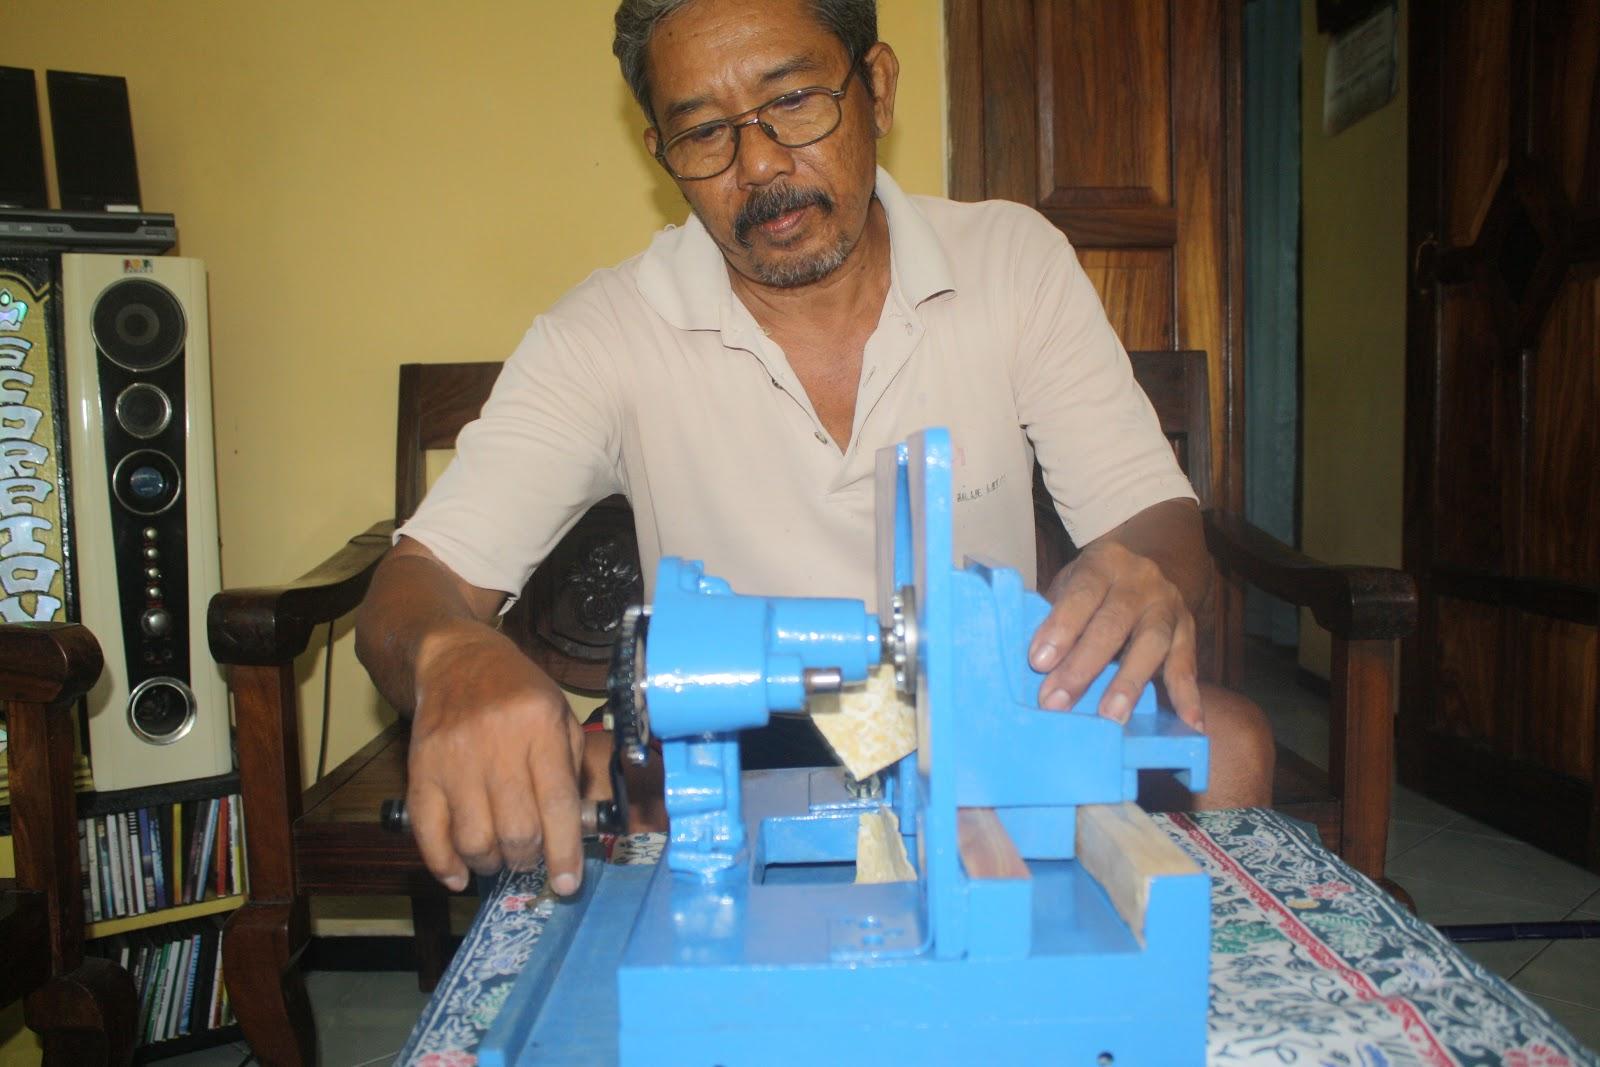 MENGIRIS TEMPE - Caram tengah memperagakan cara kerja mesin ciptaanya ...